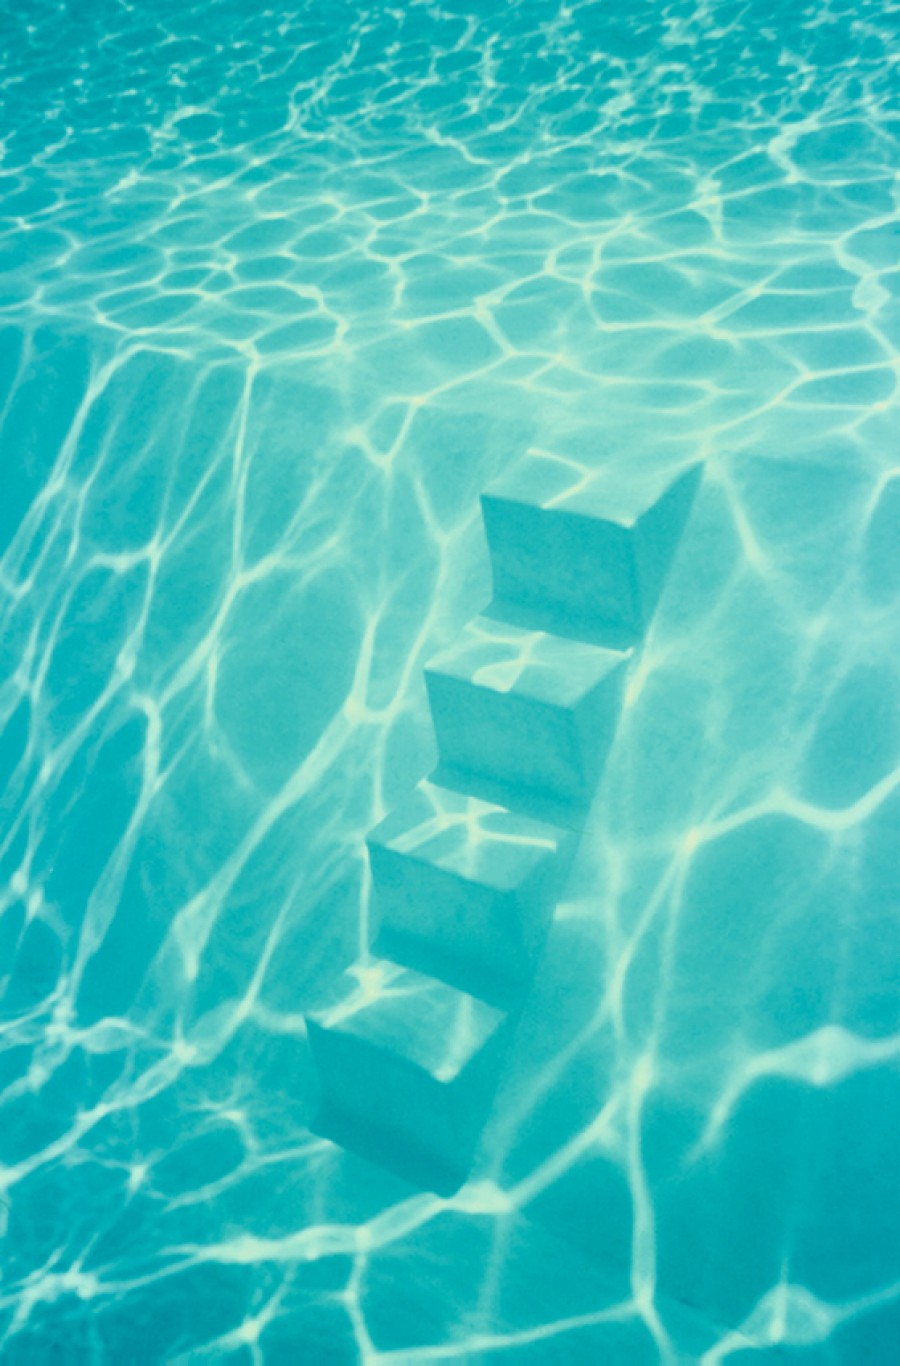 S. T. (piscina)